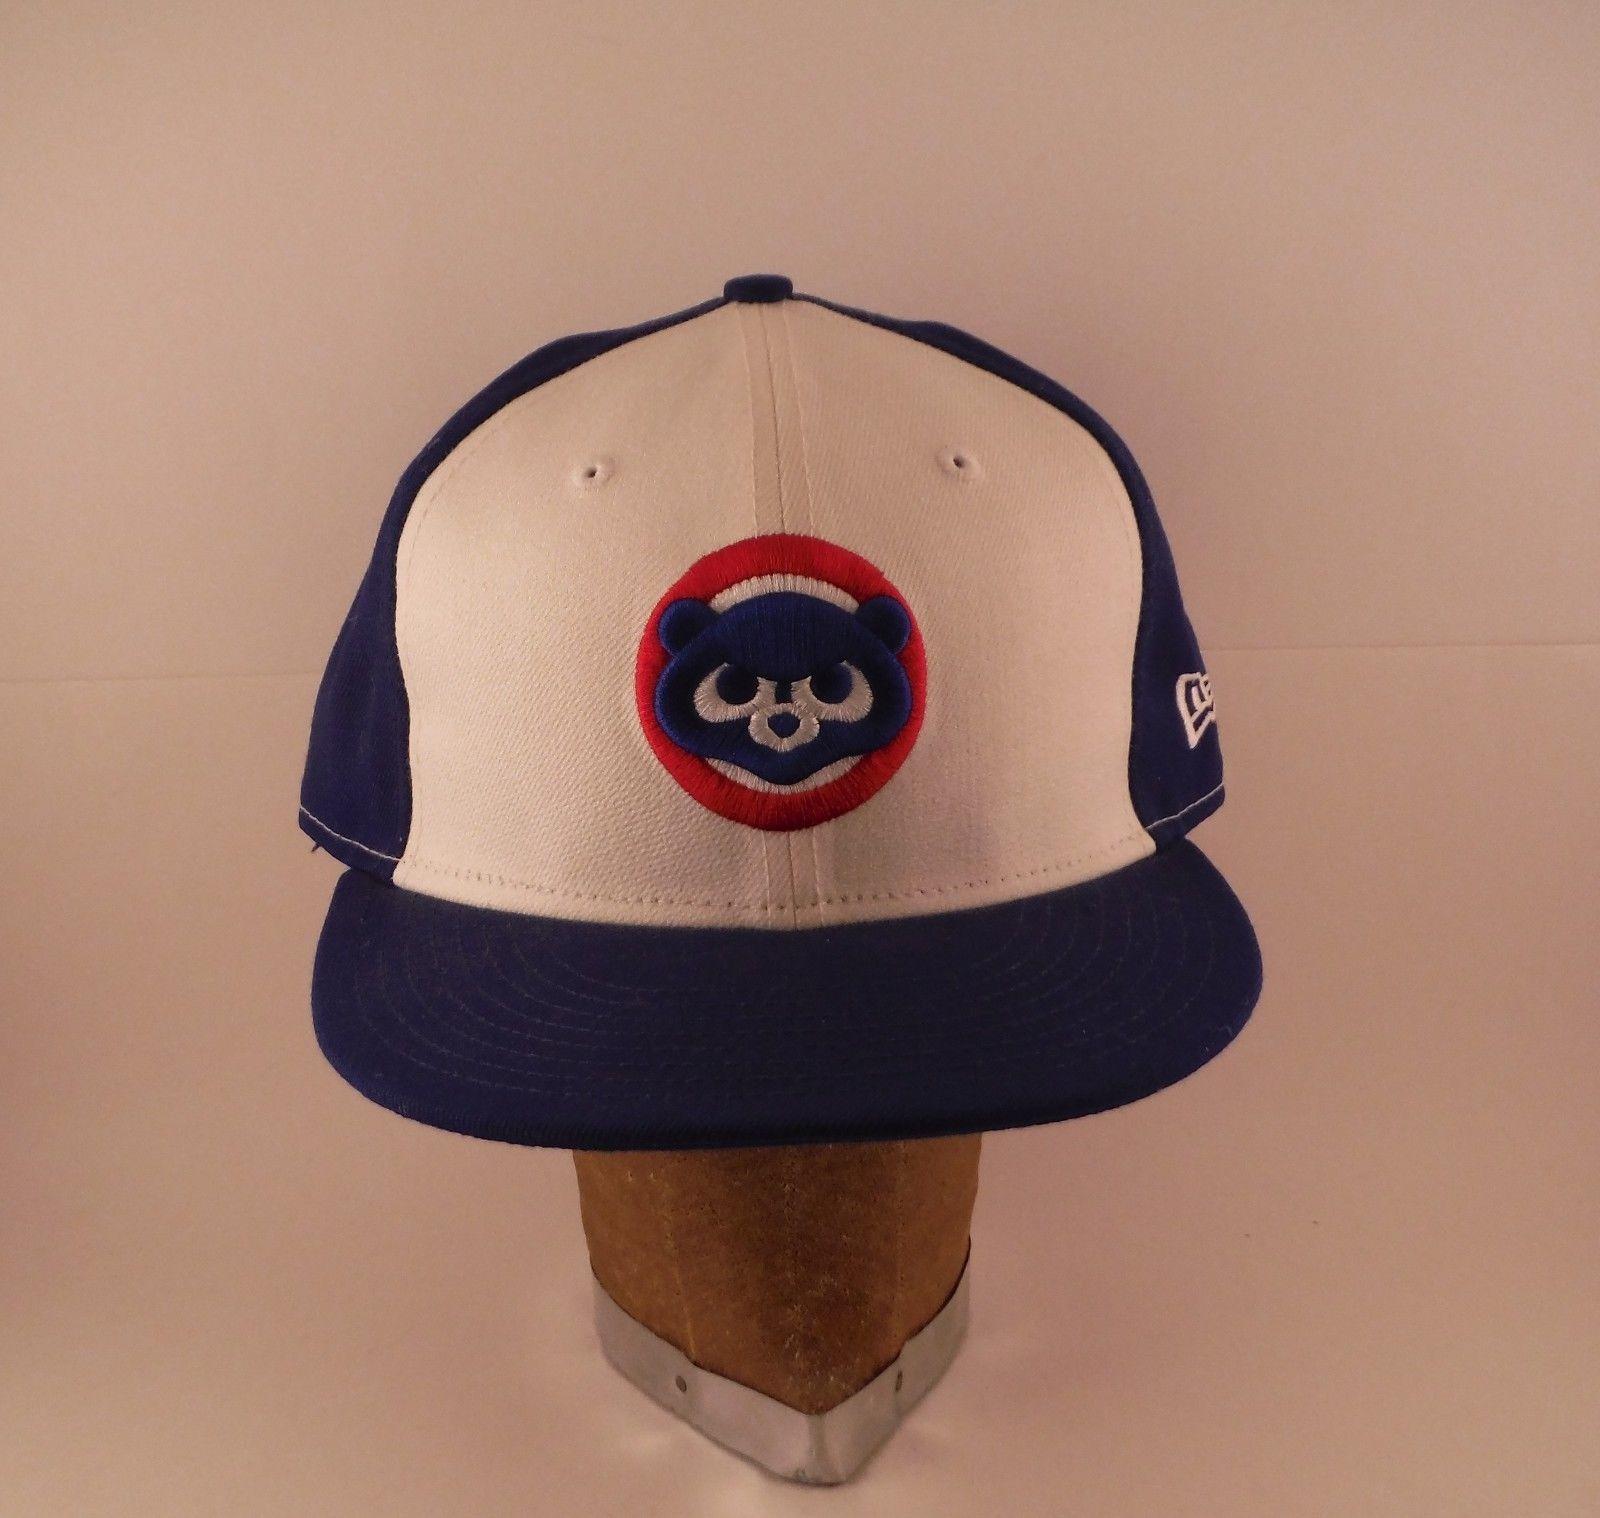 03dc40fd077 S l1600. S l1600. Previous. Chicago Cubs Cub Logo 100% Wool New Era Baseball  Hat Cap Mens Fitted 7 3 · Chicago Cubs Cub ...